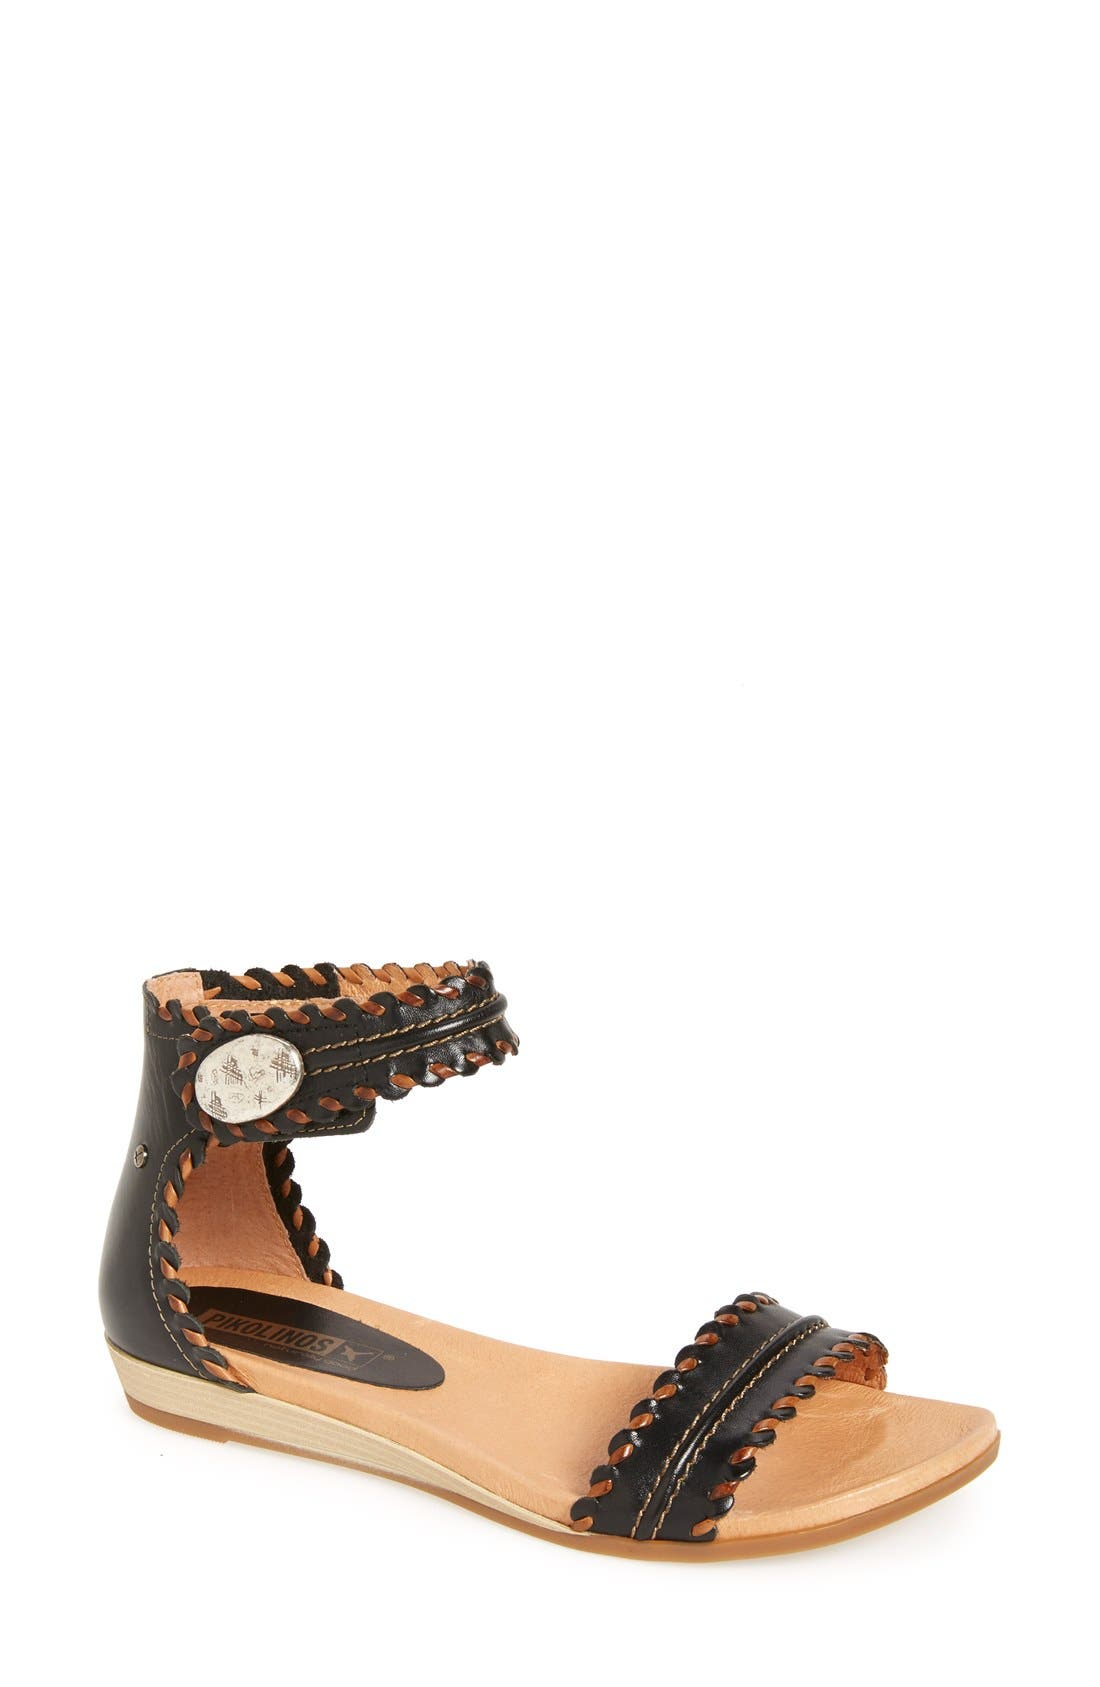 'Alcudia' Ankle Strap Sandal,                             Main thumbnail 1, color,                             001